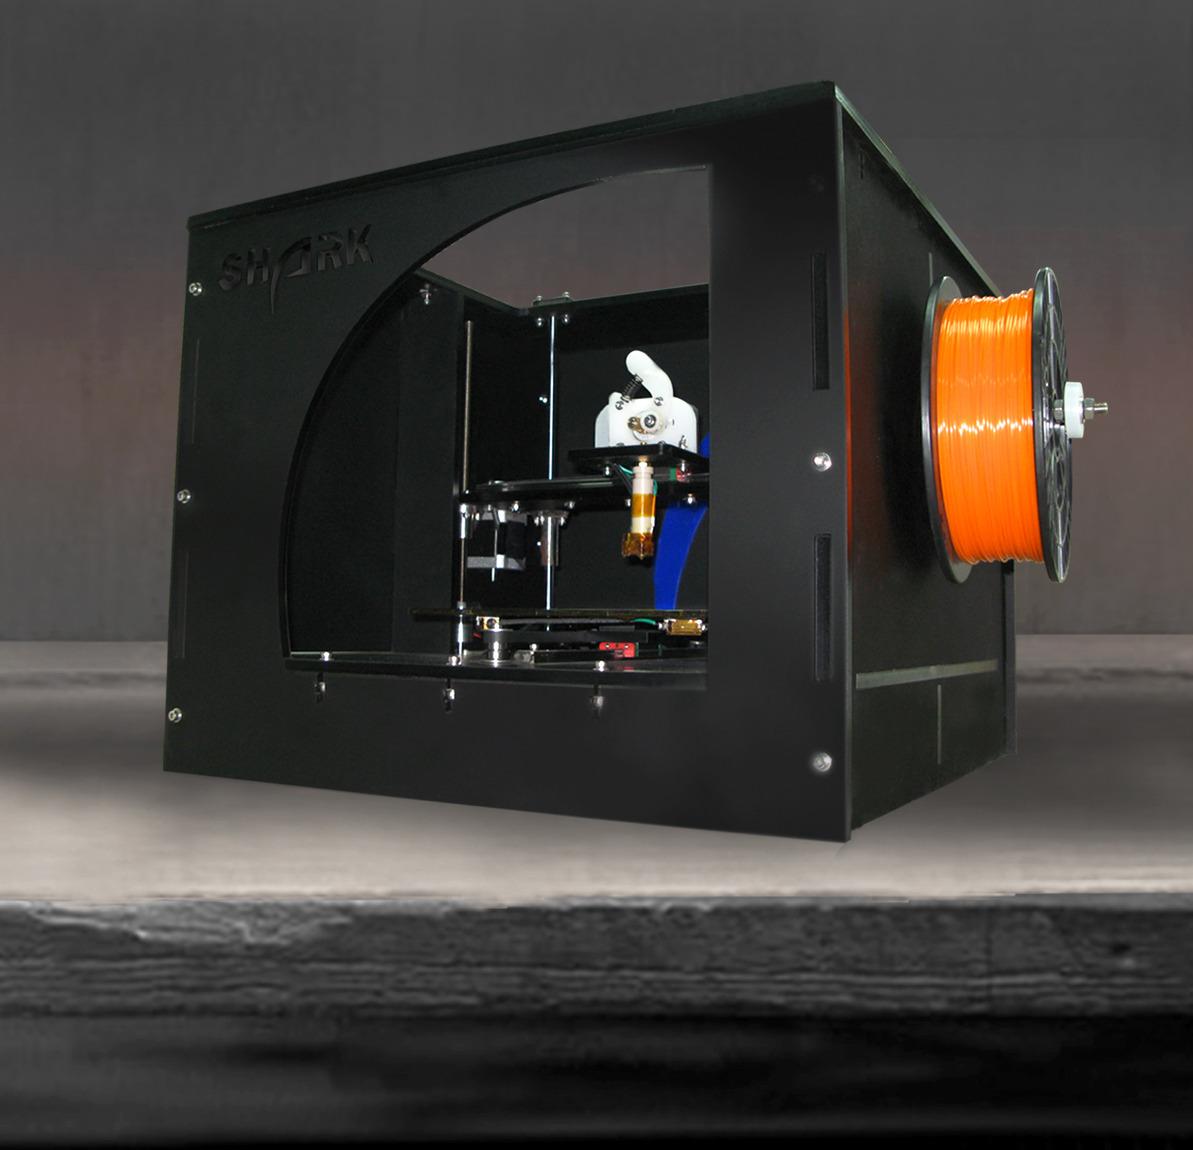 shark-shark-3d-printer-02.jpg